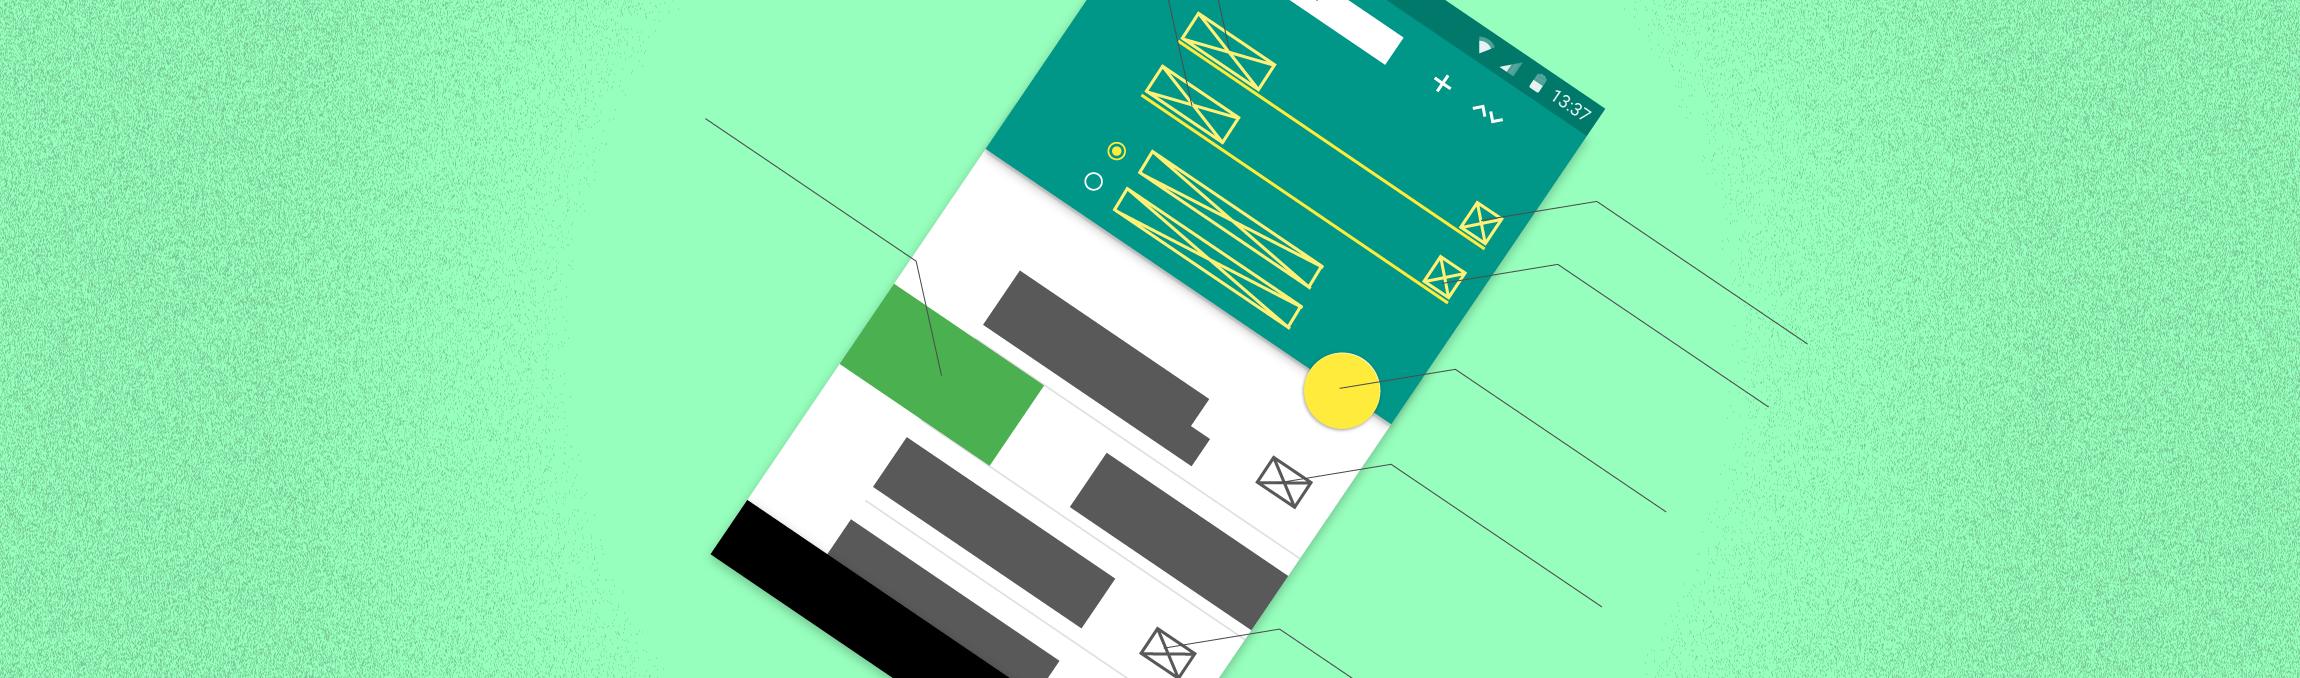 Android Testing Mockup